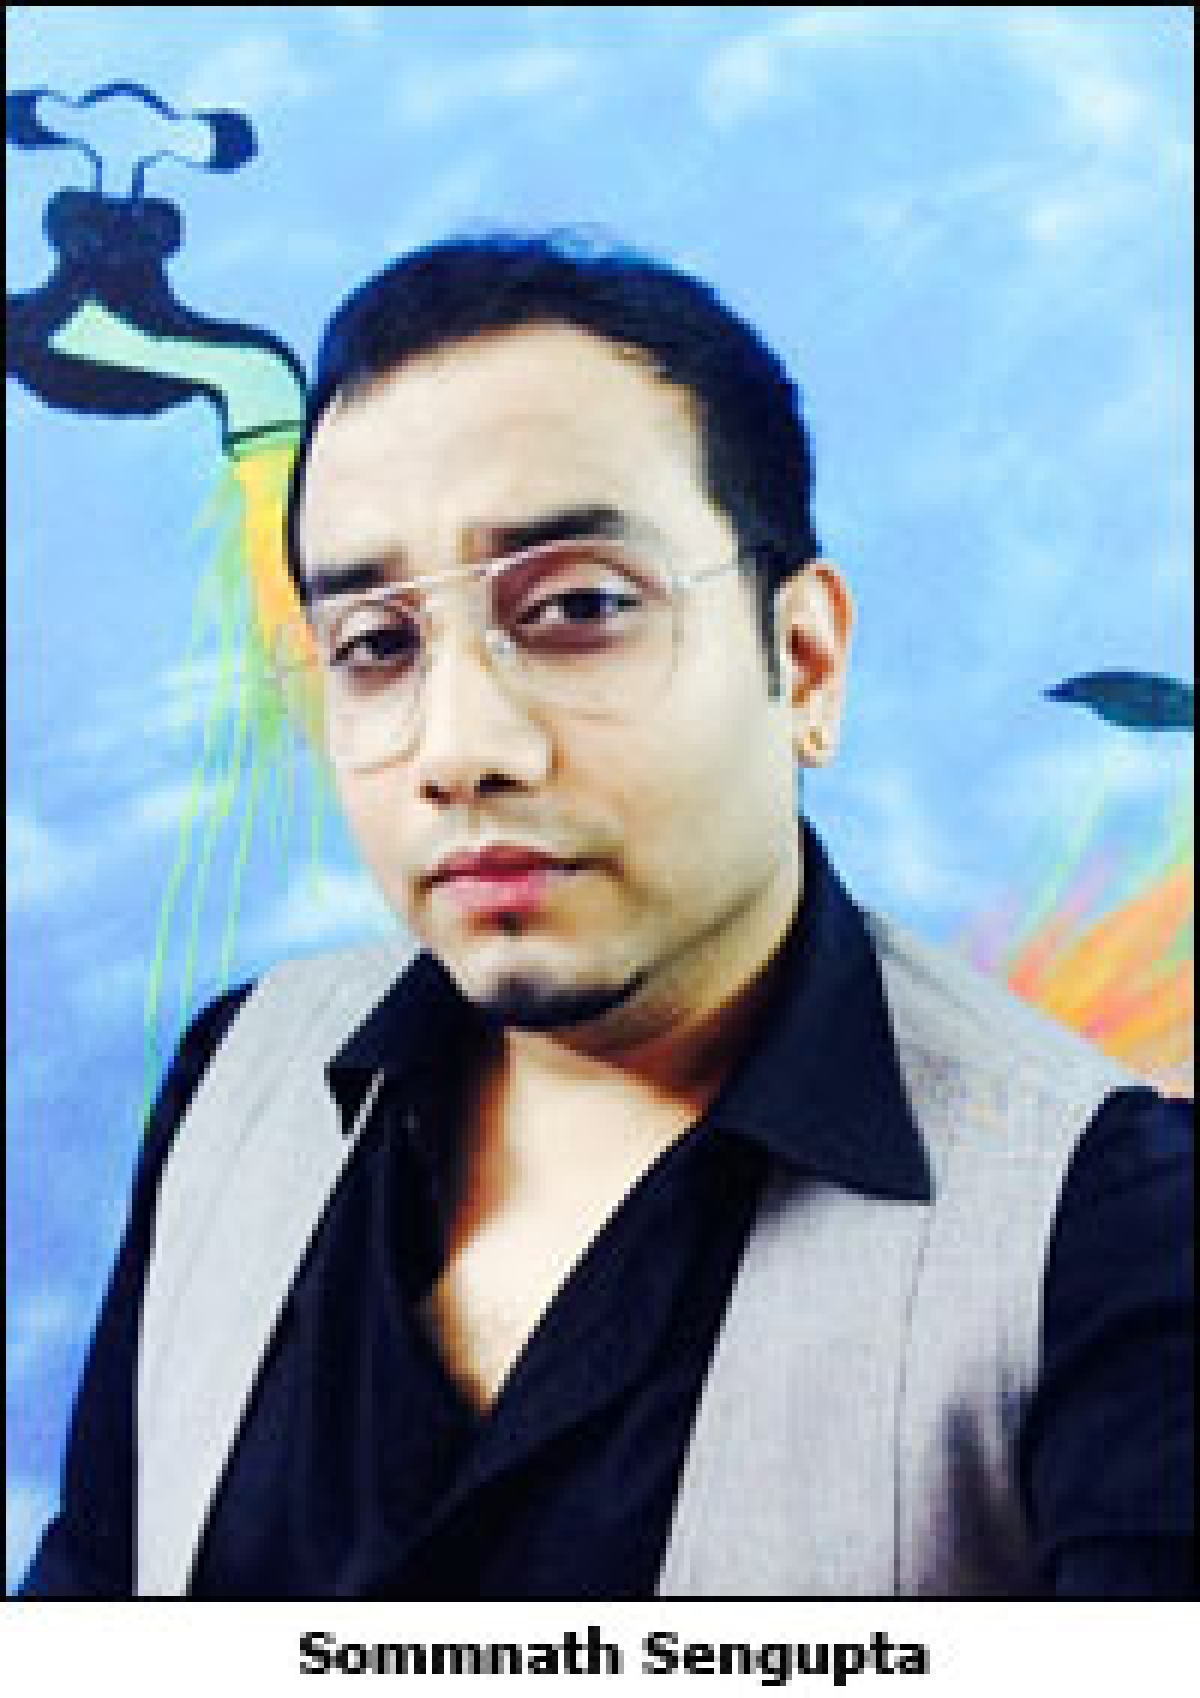 Sommnath Sengupta appointed Kinetic India's NCD